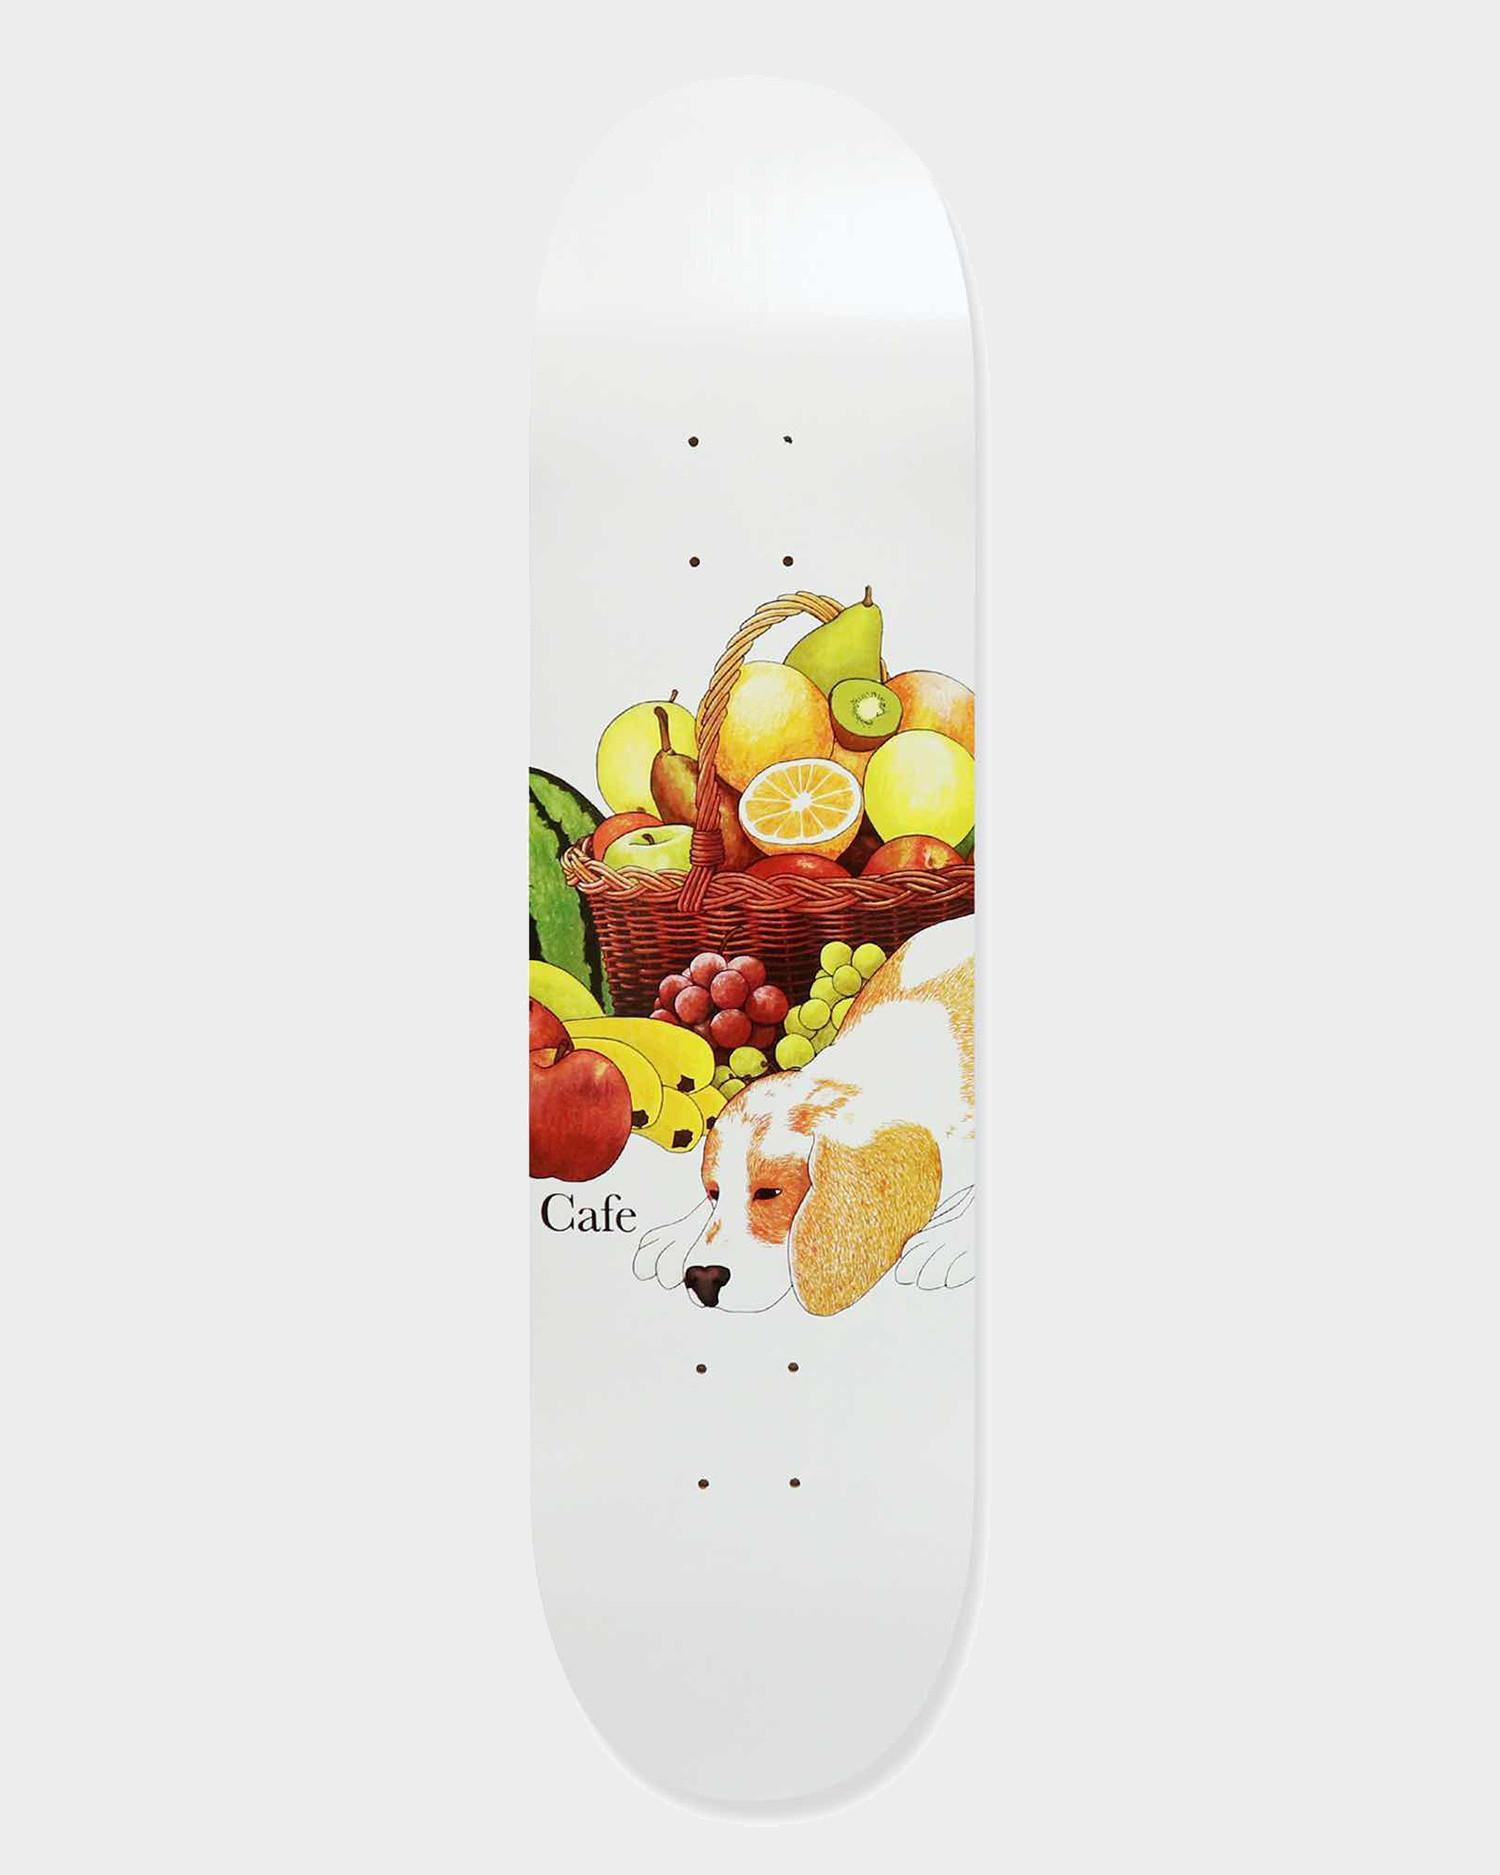 Skateboard Cafe Healthy Deck White 8.25